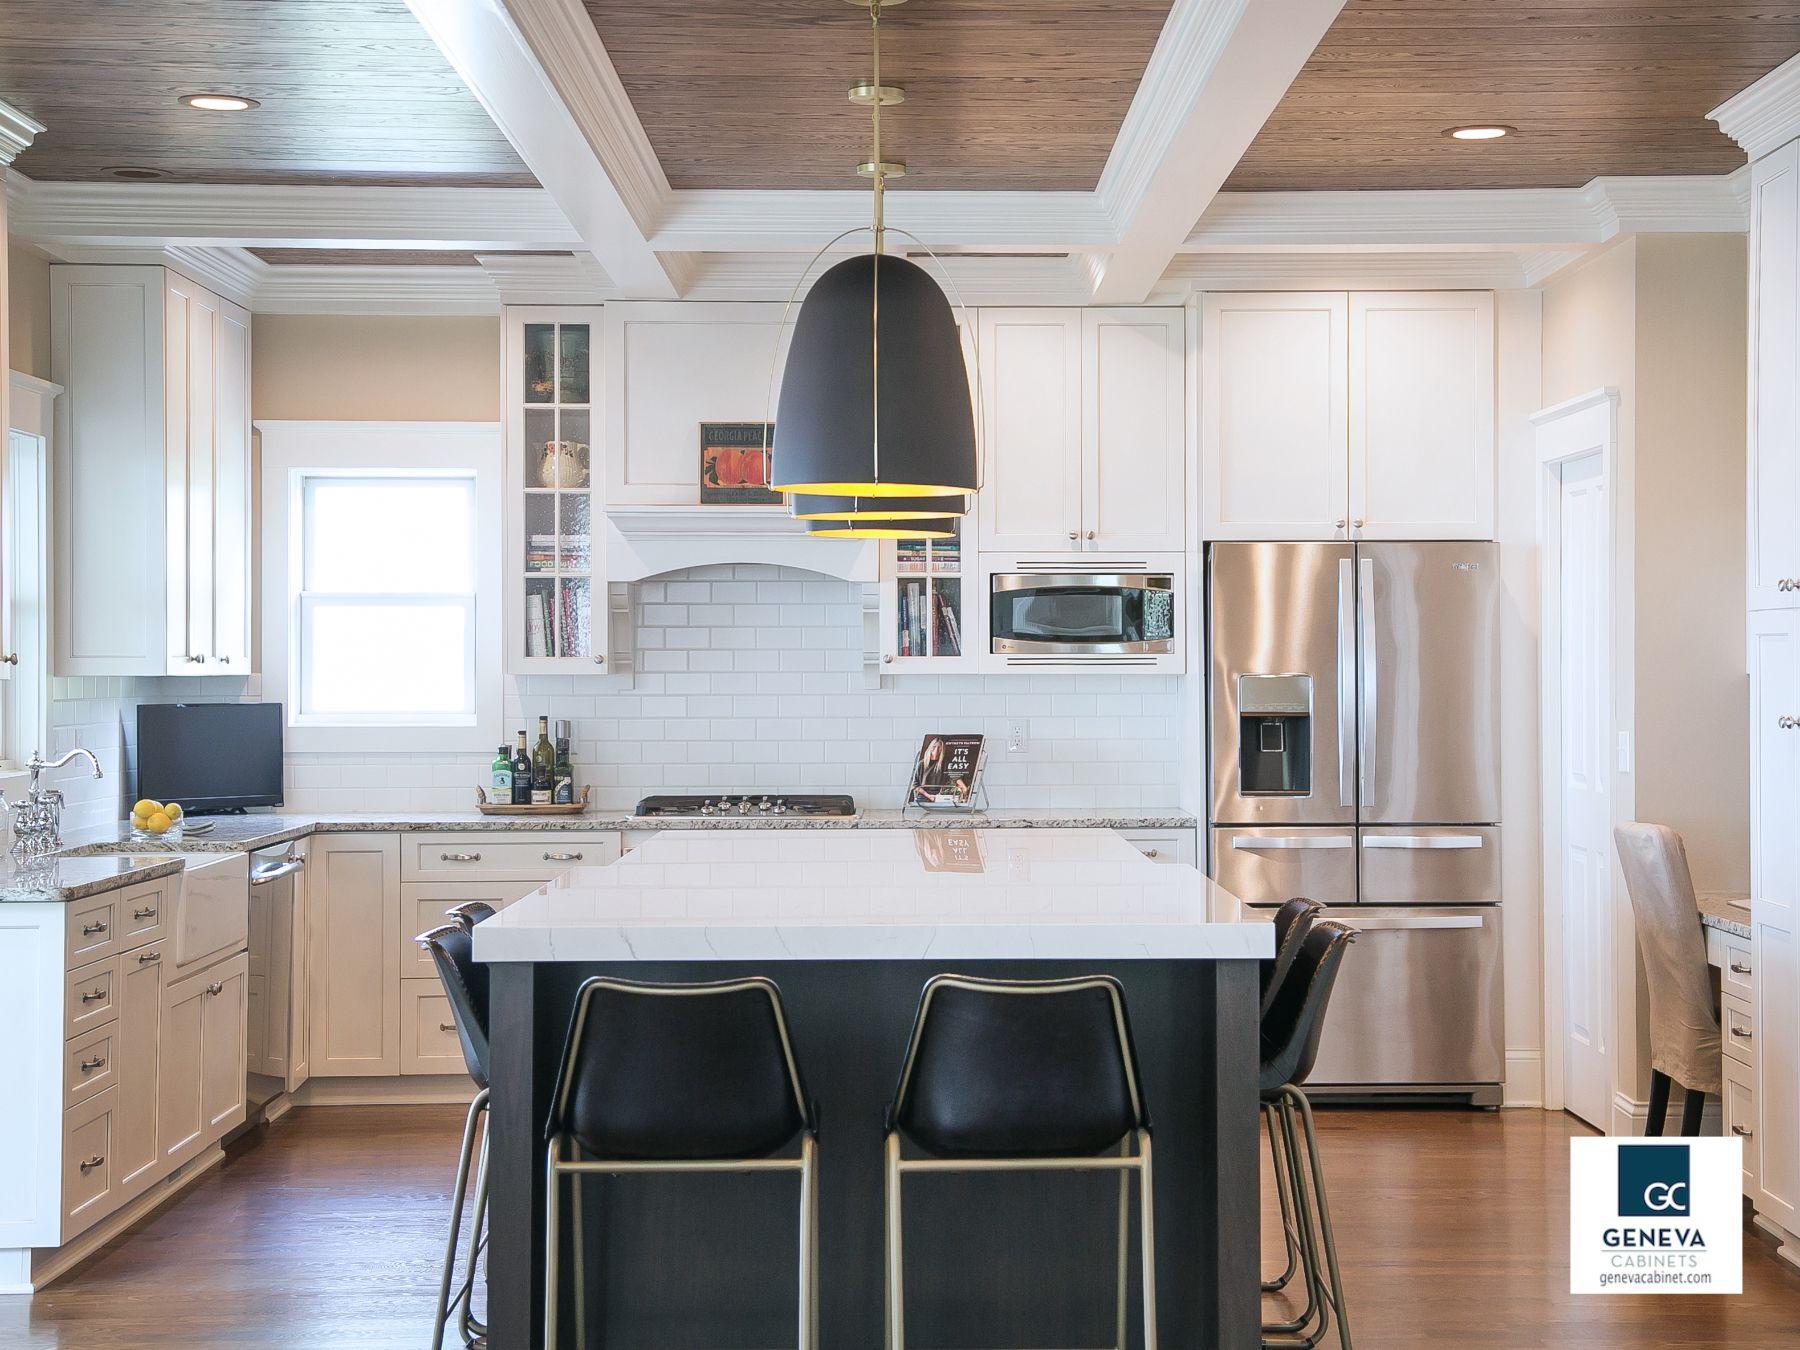 New Kitchen Island Transforms The Kitchen Geneva Cabinet Company Llc Contemporary Kitchen Tiles Portable Kitchen Island Small Condo Kitchen